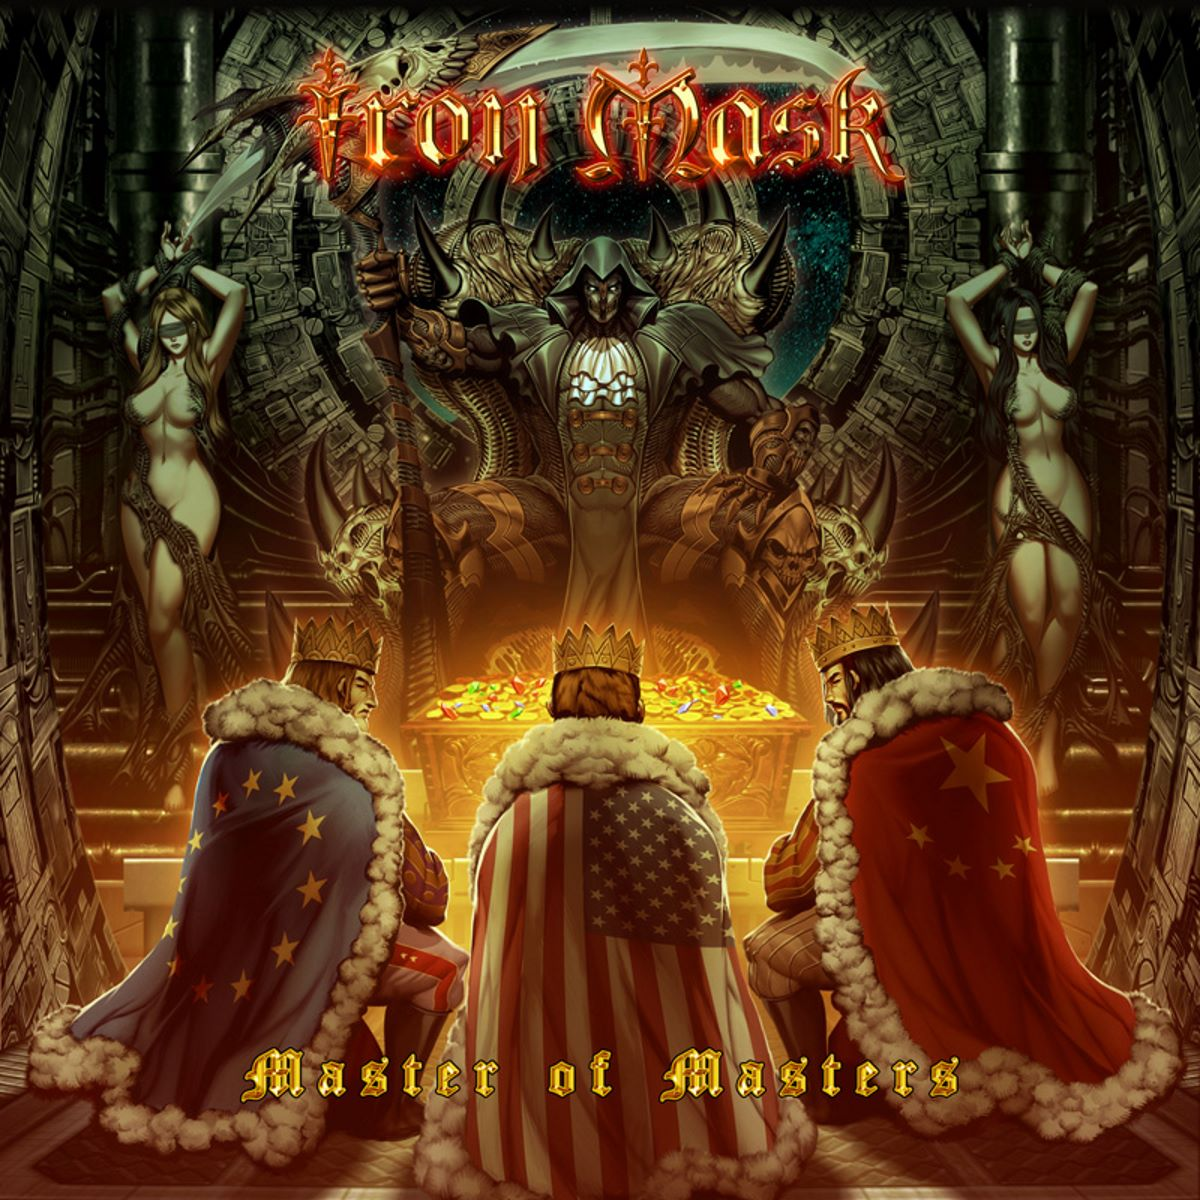 IRON MASK - master of masters - album cover